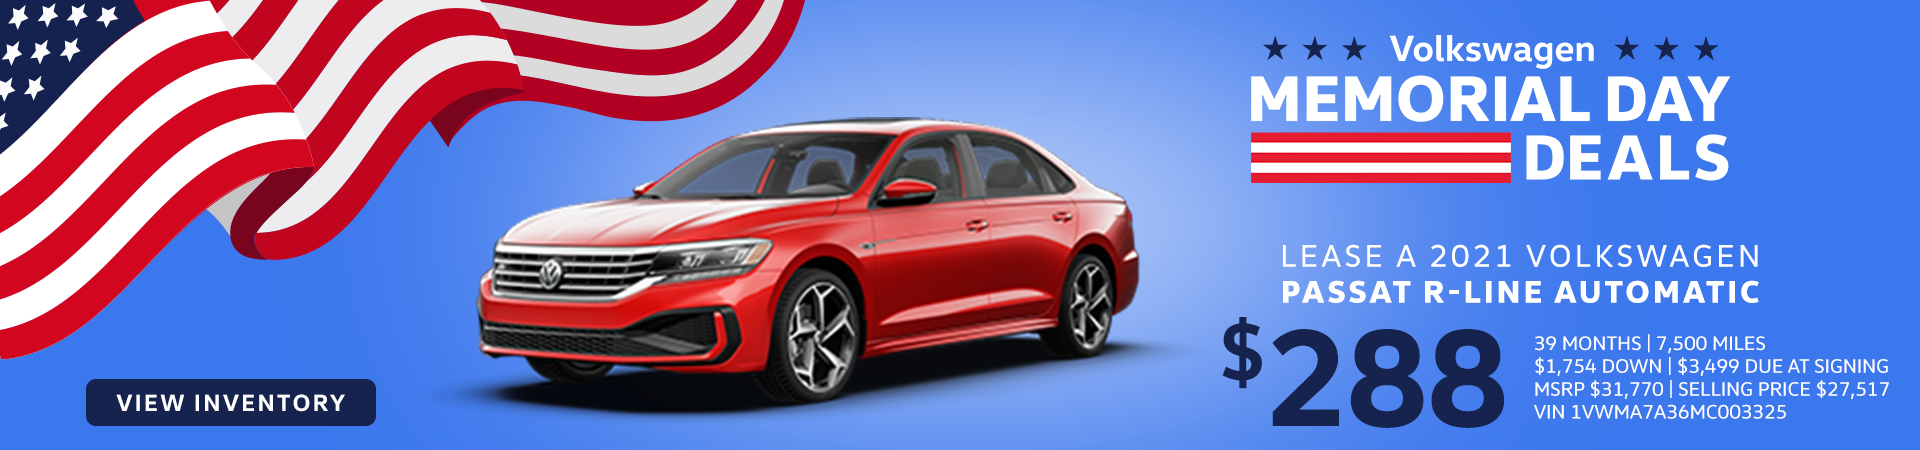 Wynn VW_May Offer_Passat